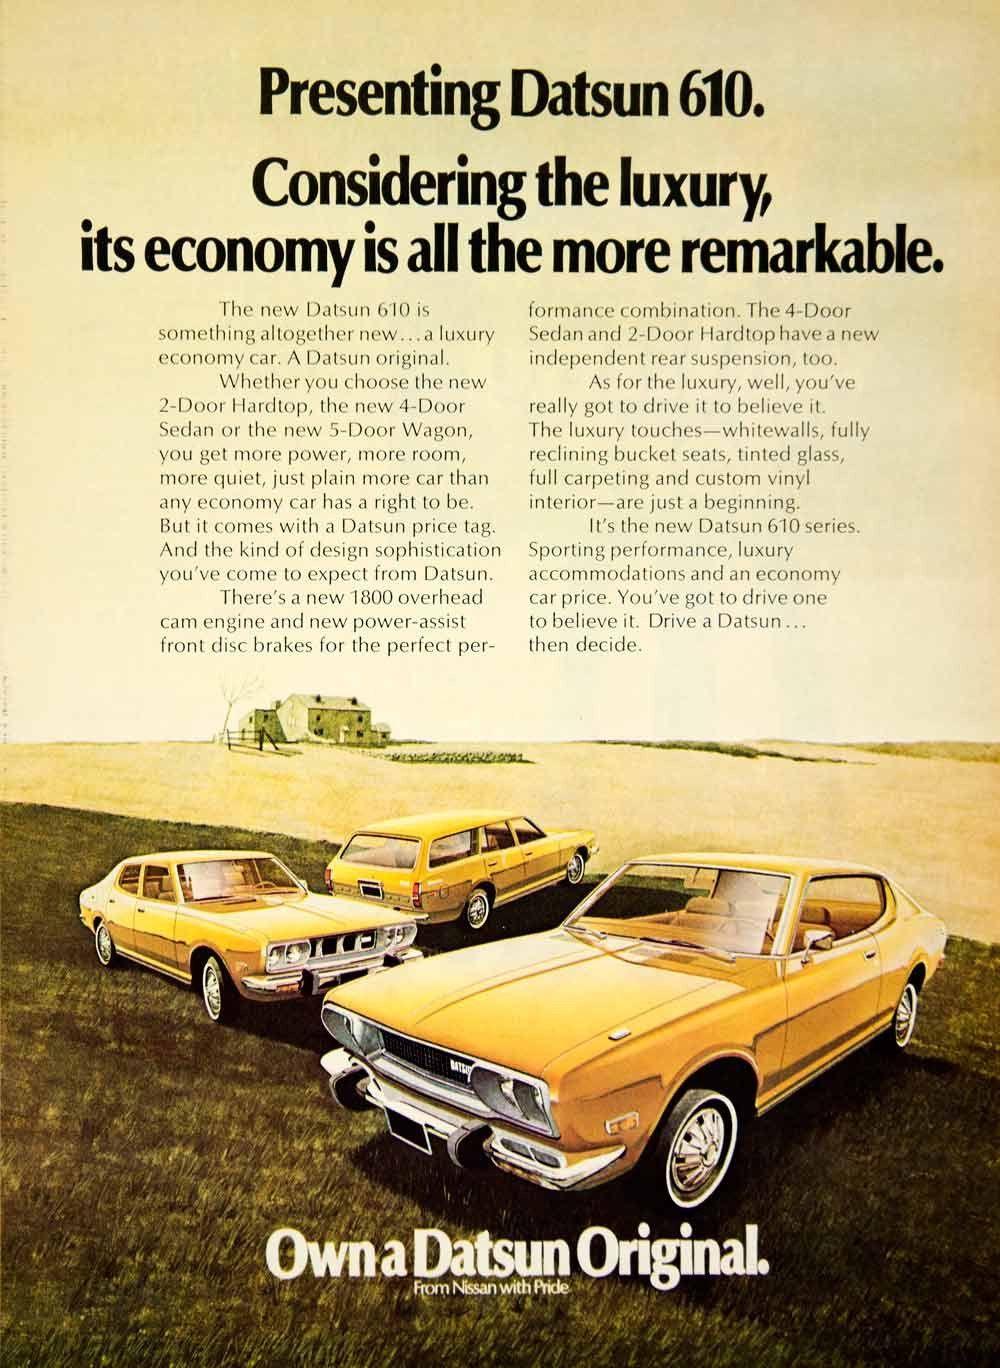 1972 Ad Datsun 610 Hardtop Sedan Wagon Yellow Car Automobile Landscape YCD8